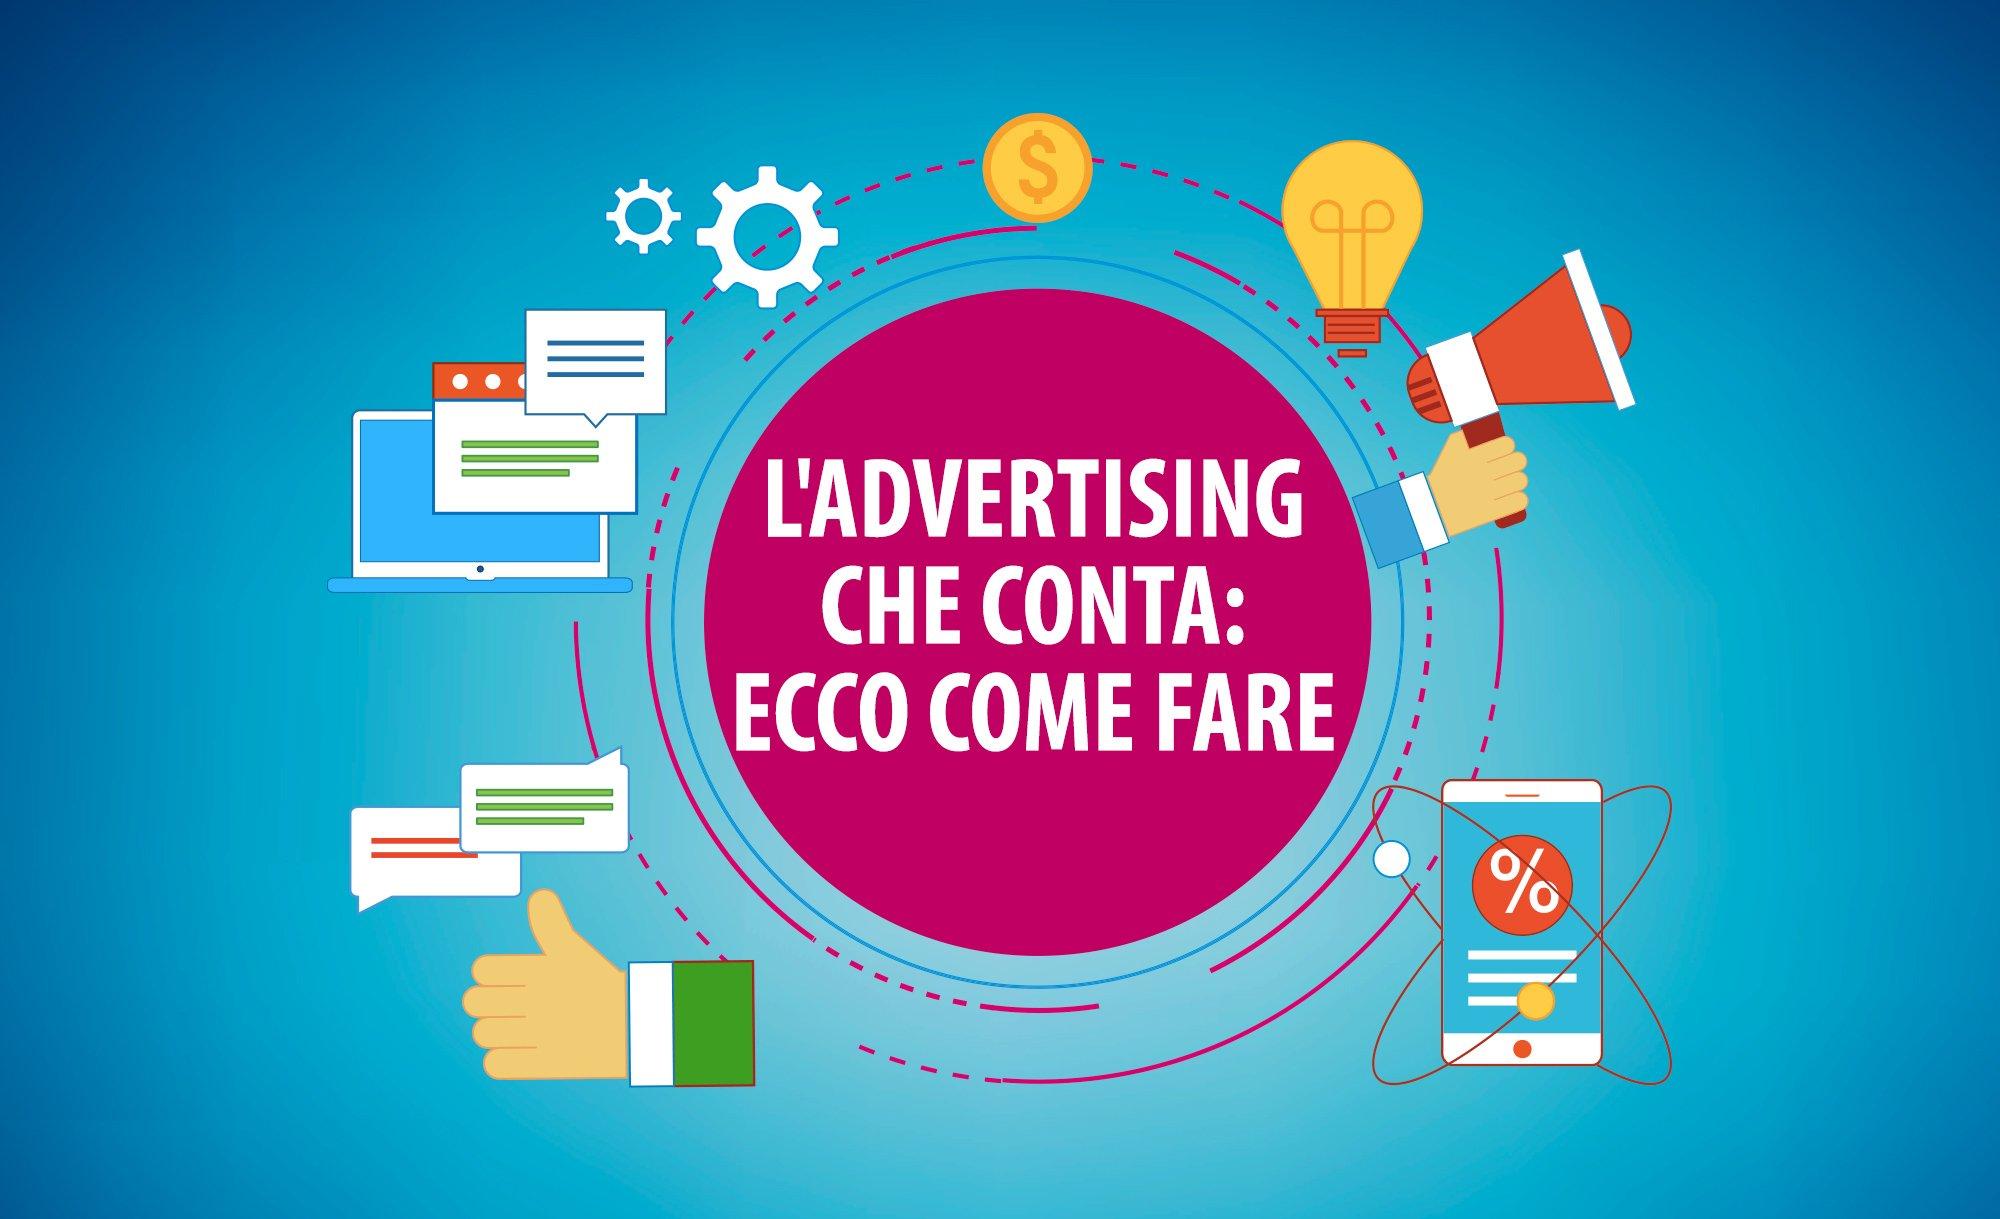 ecommerce guro Advertising-che-conta